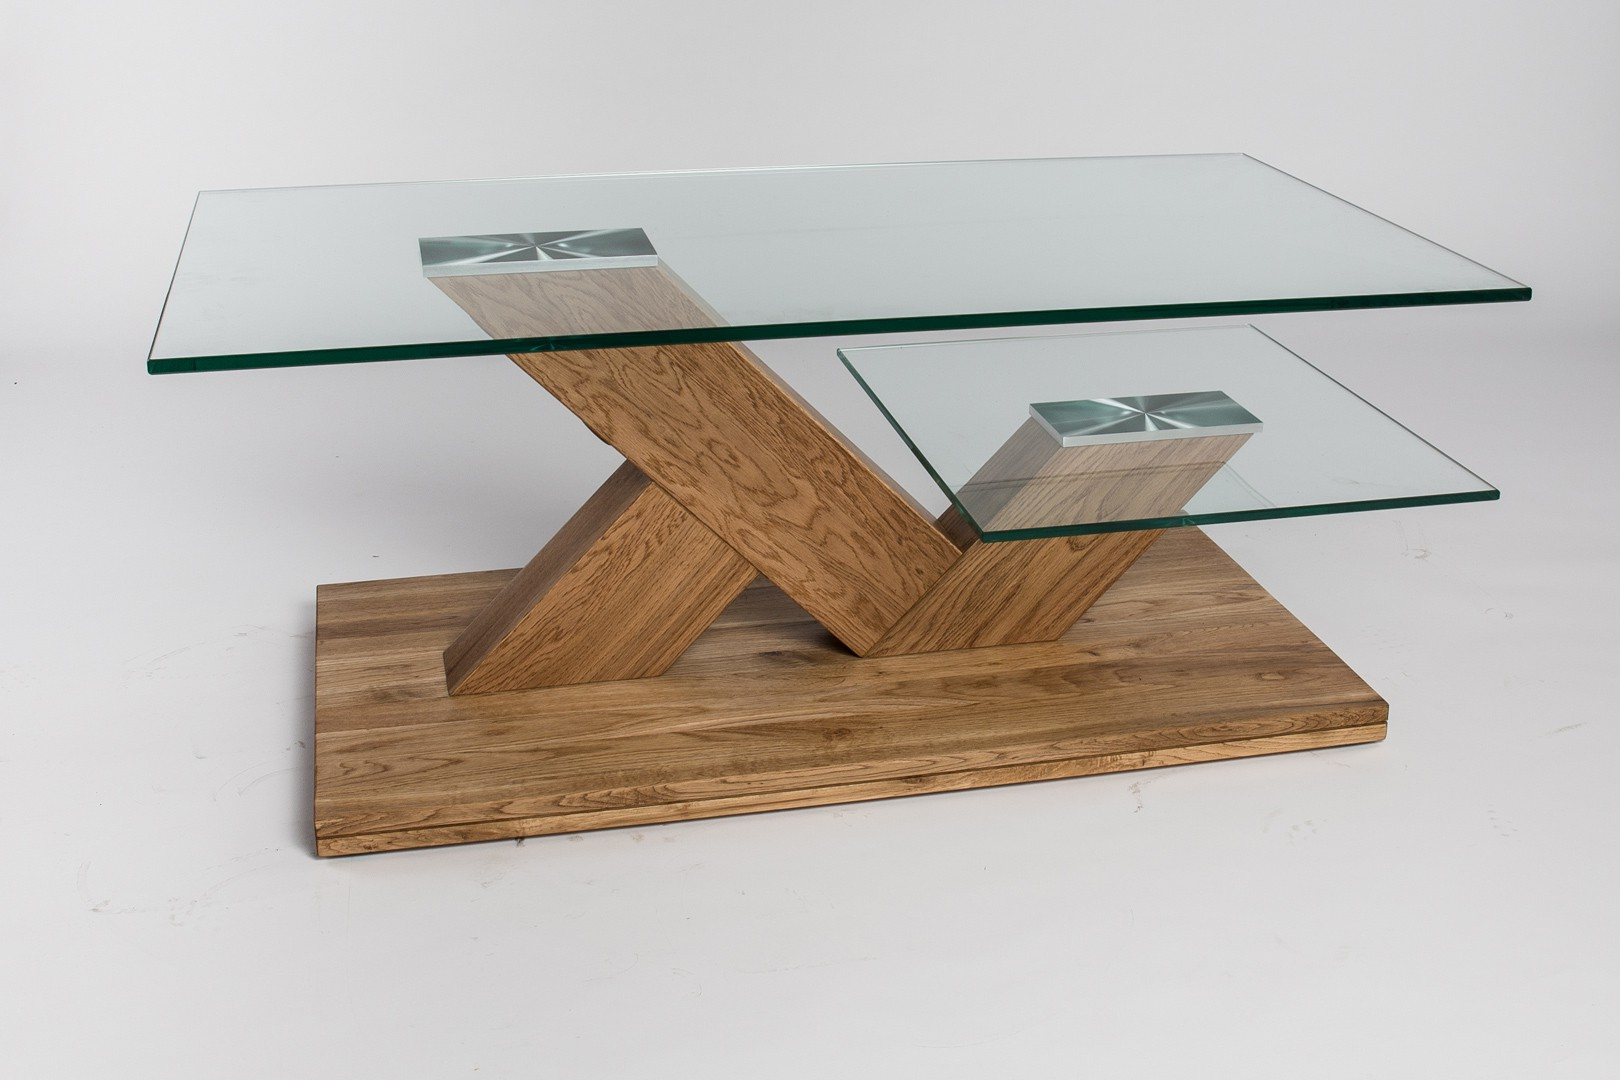 Table Basse Chene Massif Design Lille Menagefr Maison